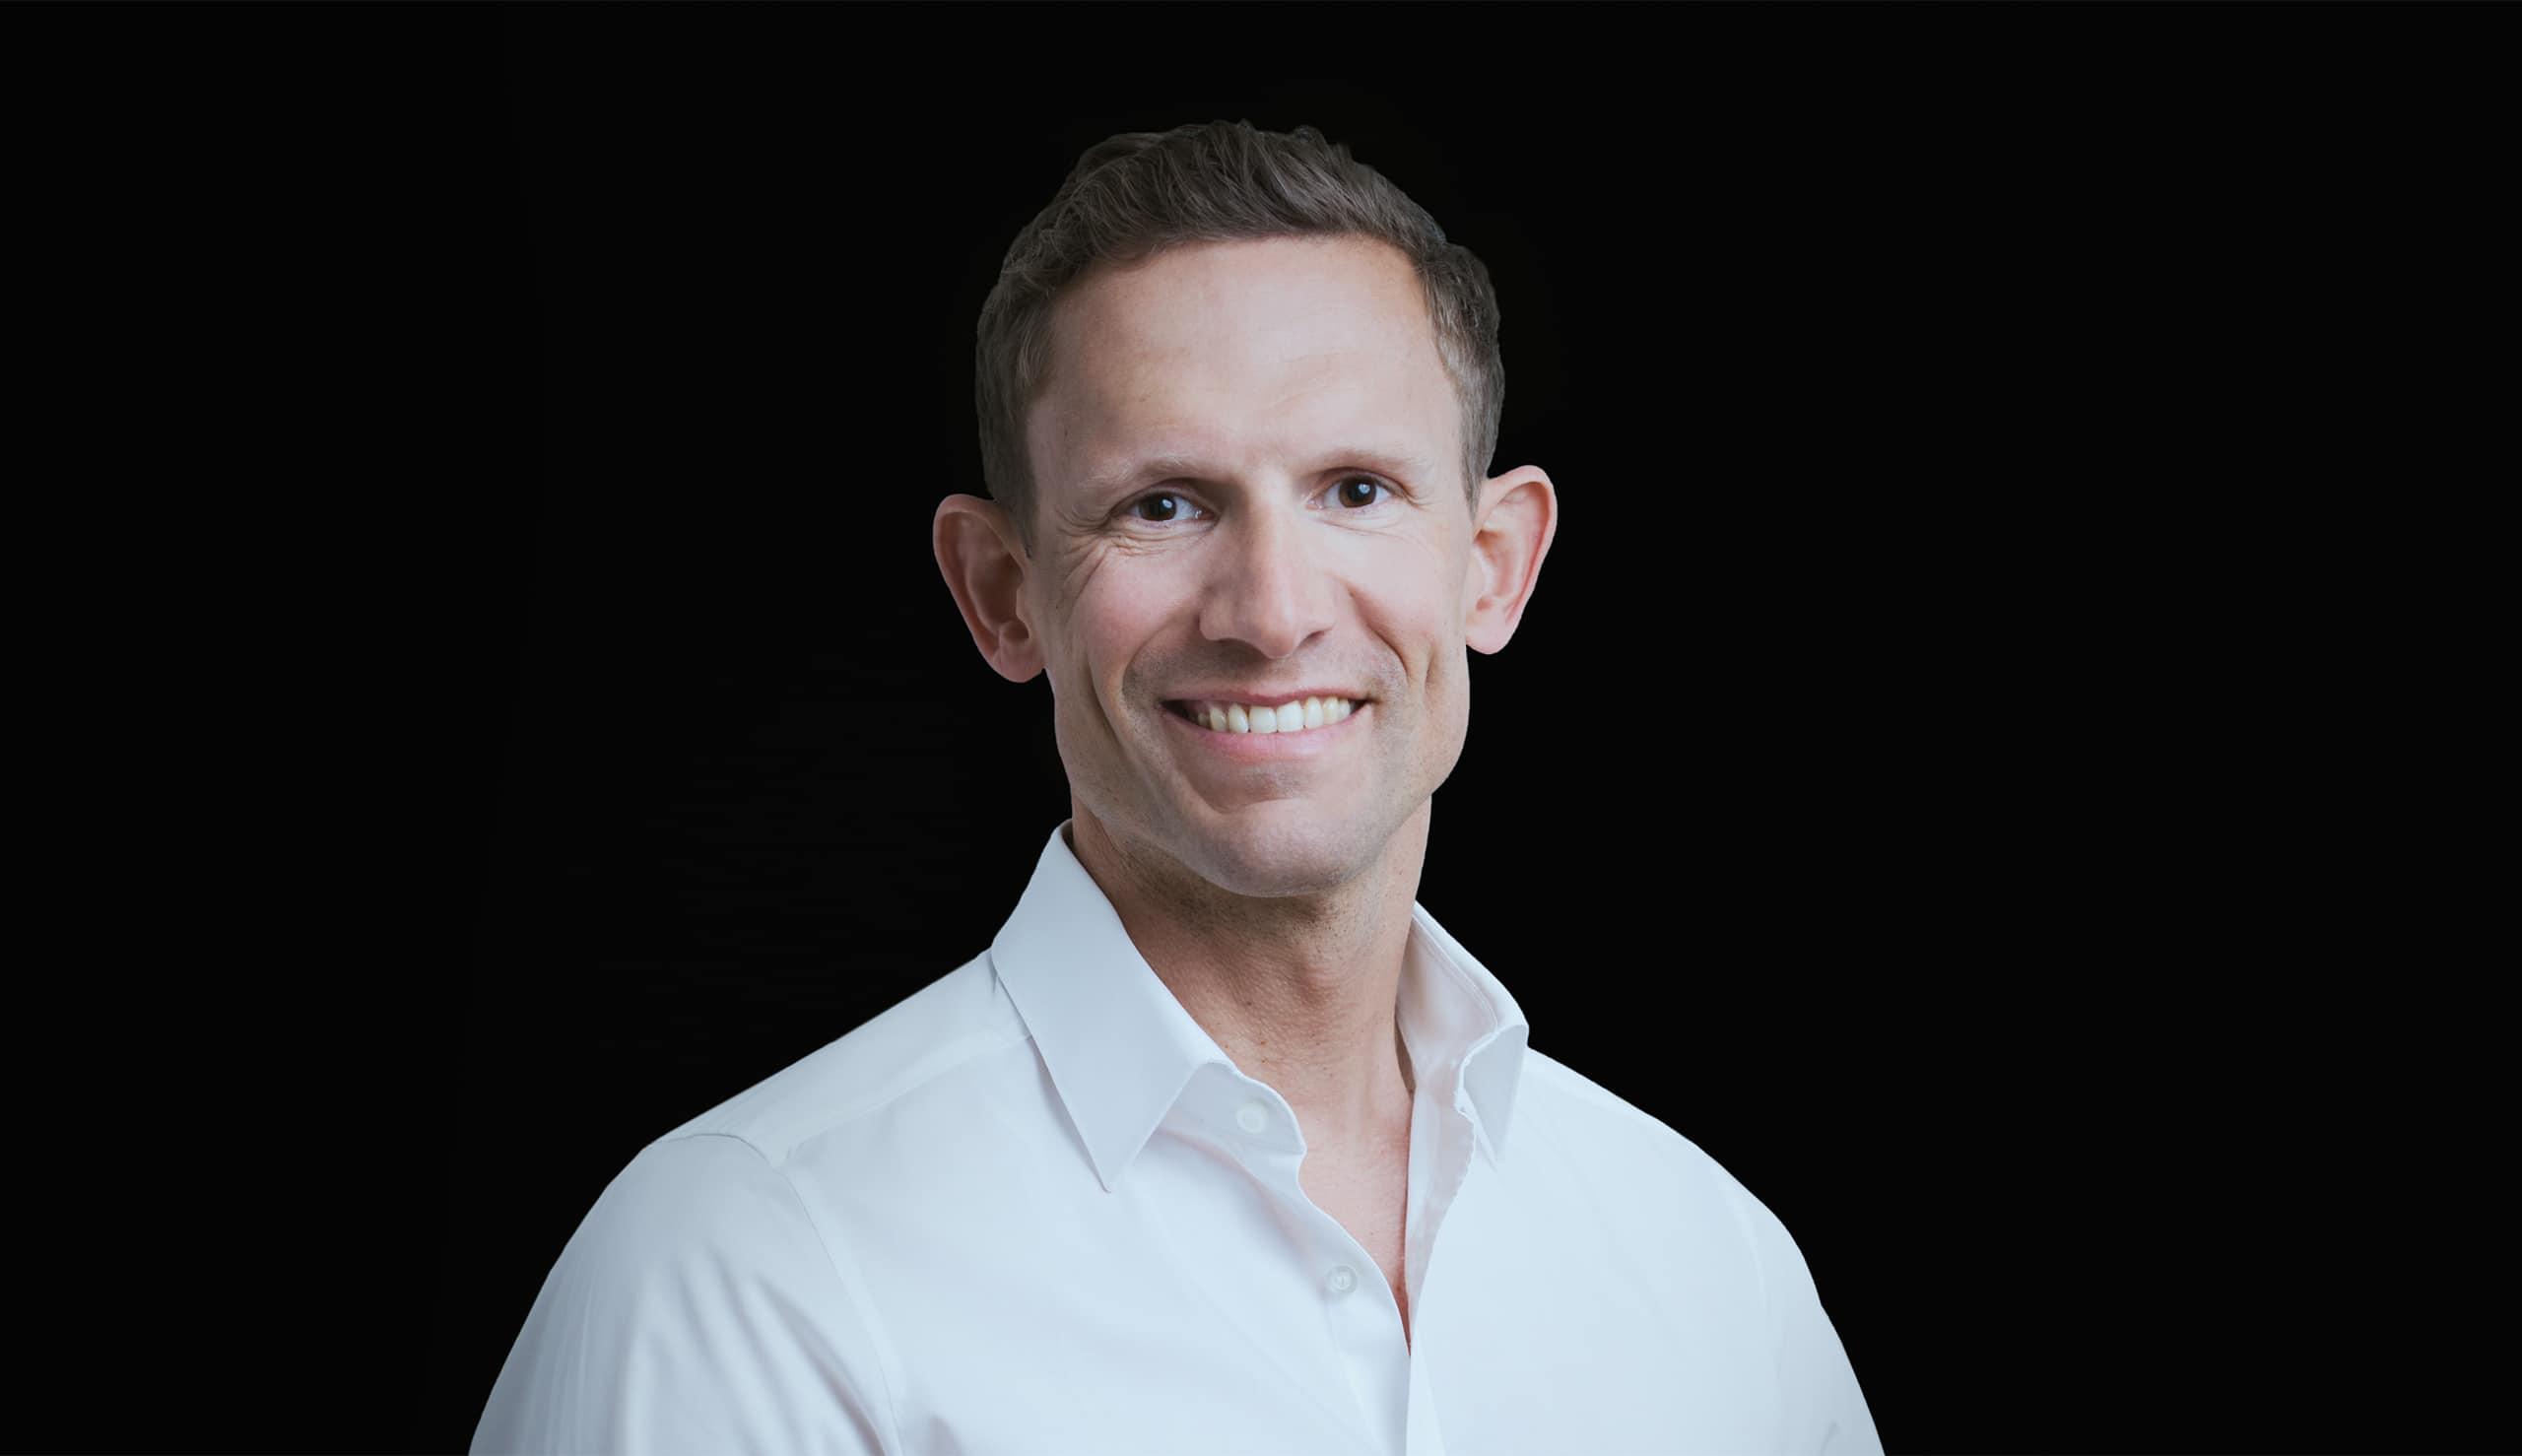 Dr. Philipp Mayr